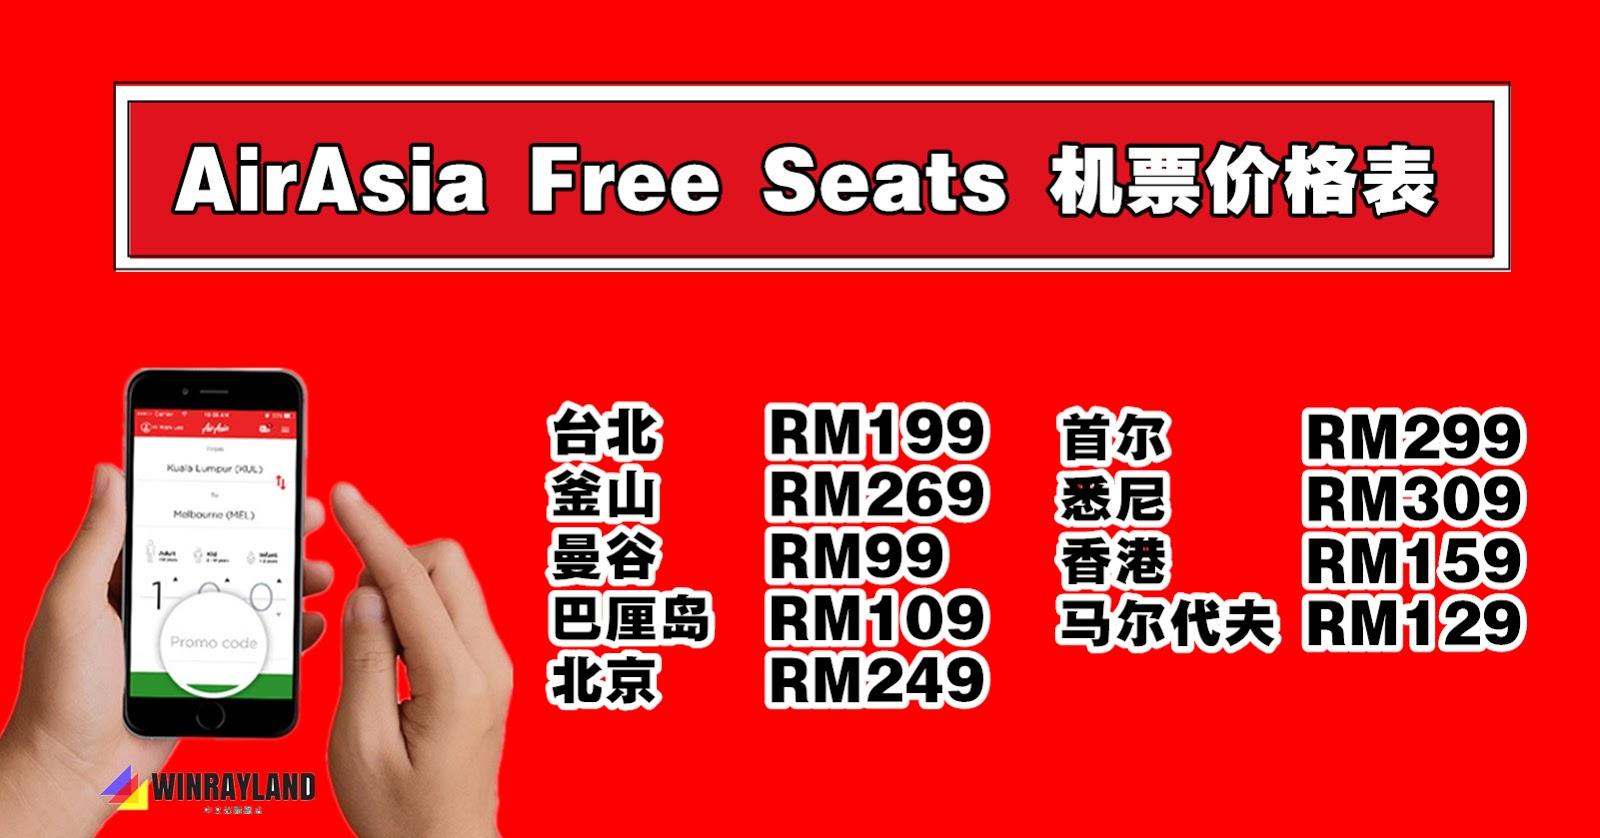 AirAsia Free Seats 机票价格表